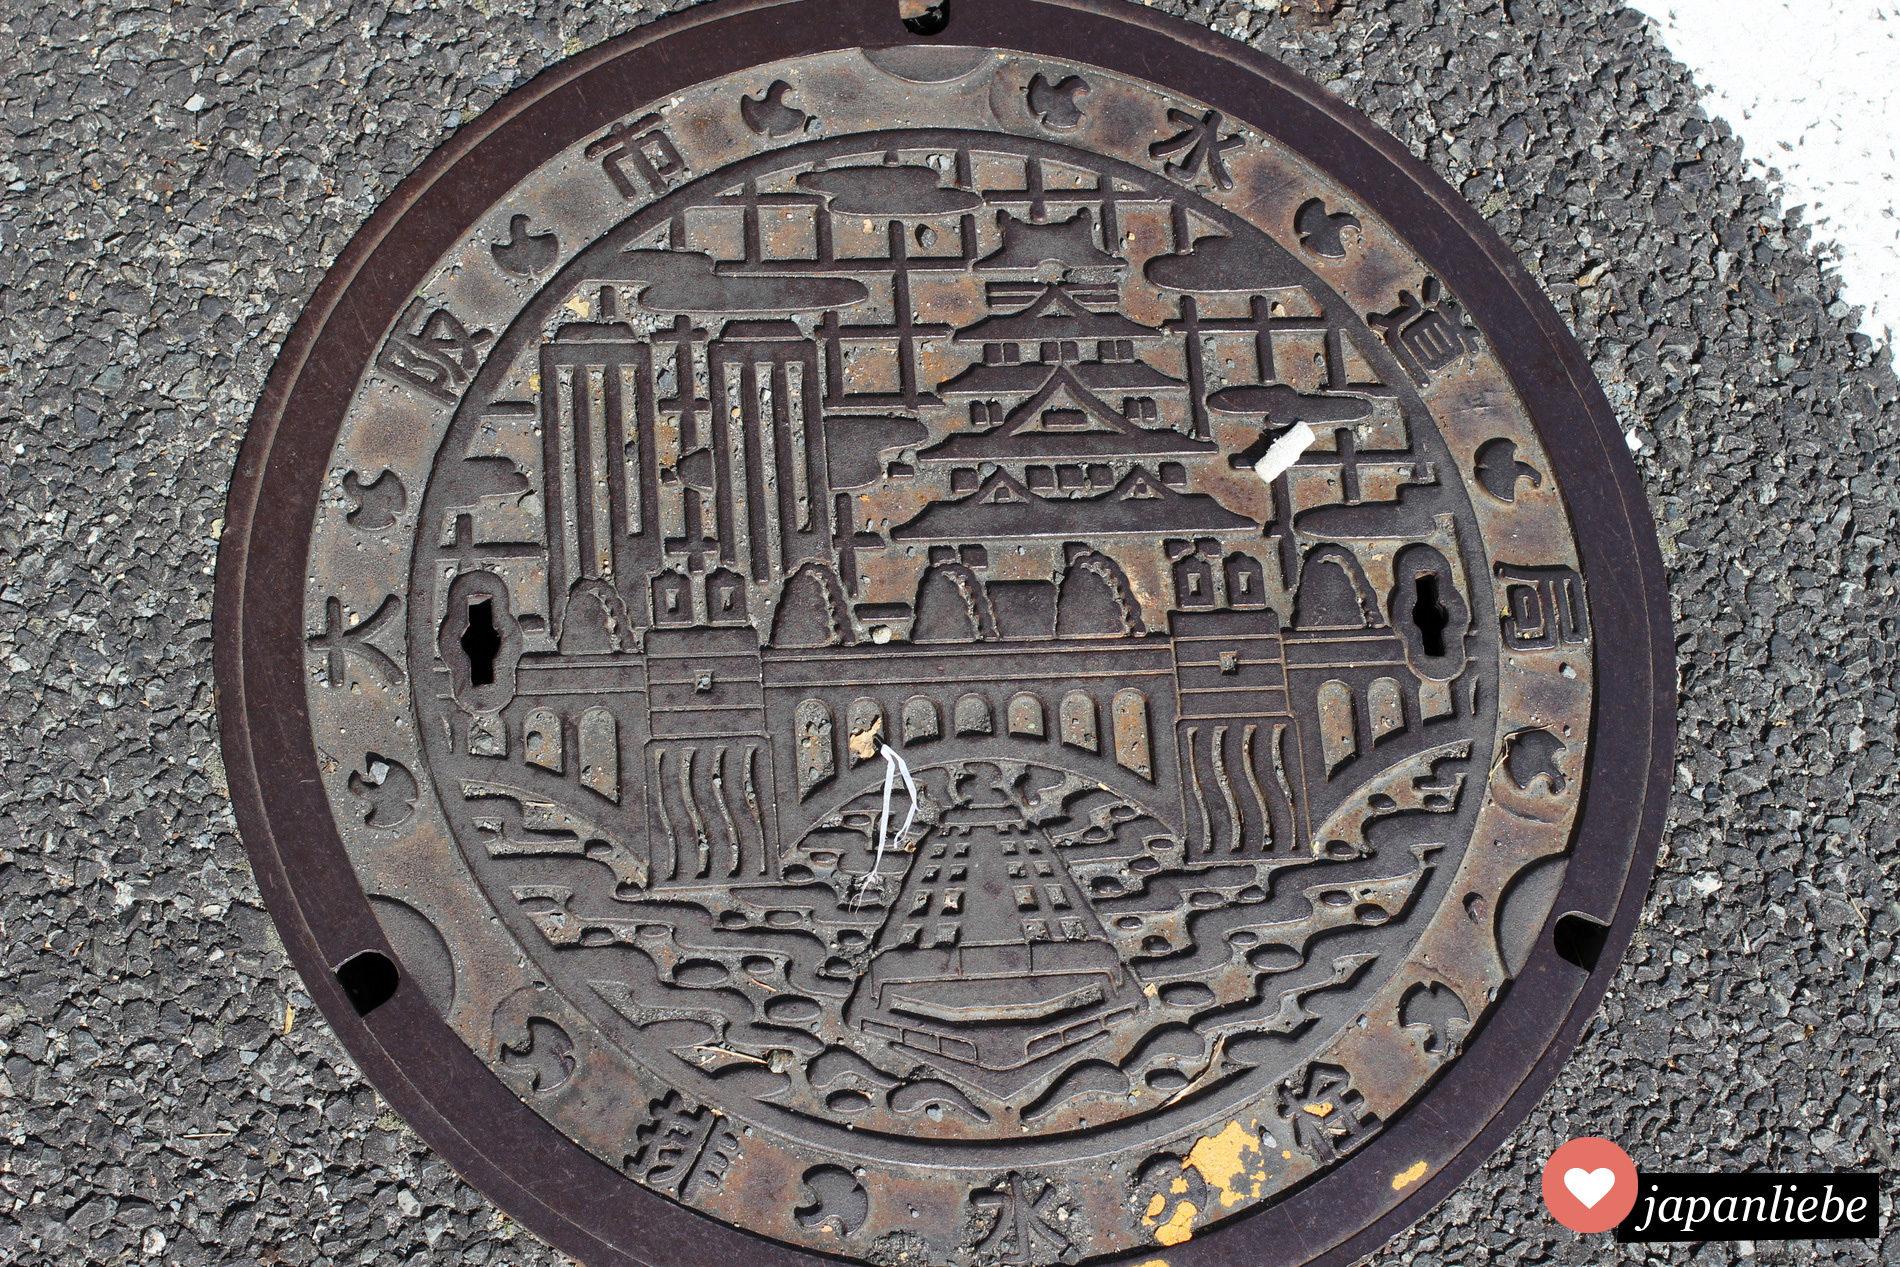 Ein Kanaldeckel in Osaka, Japan